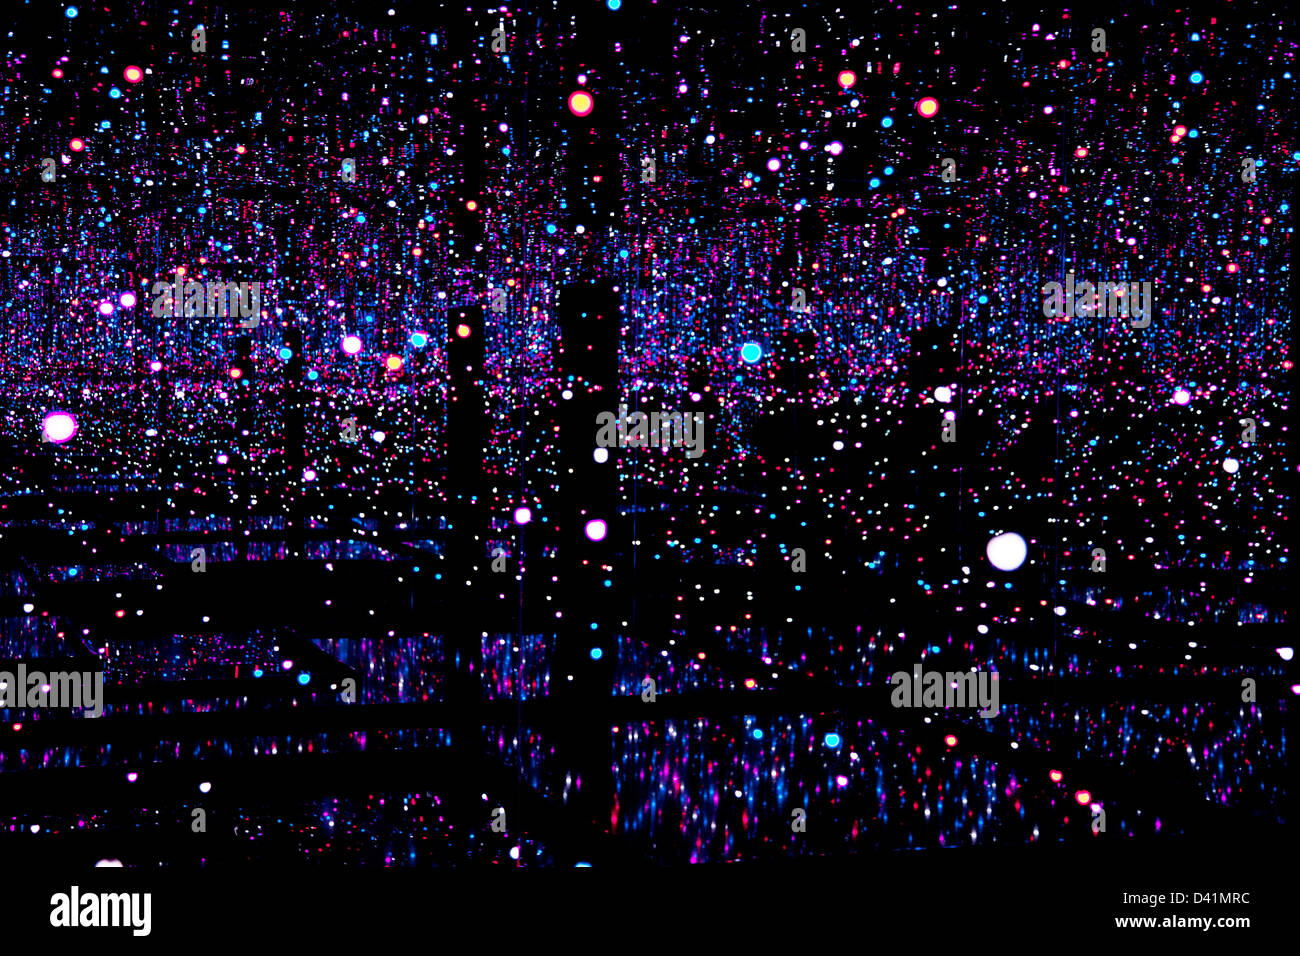 Kunstinstallation Namens Infinity Room Von Yayoi Kusama